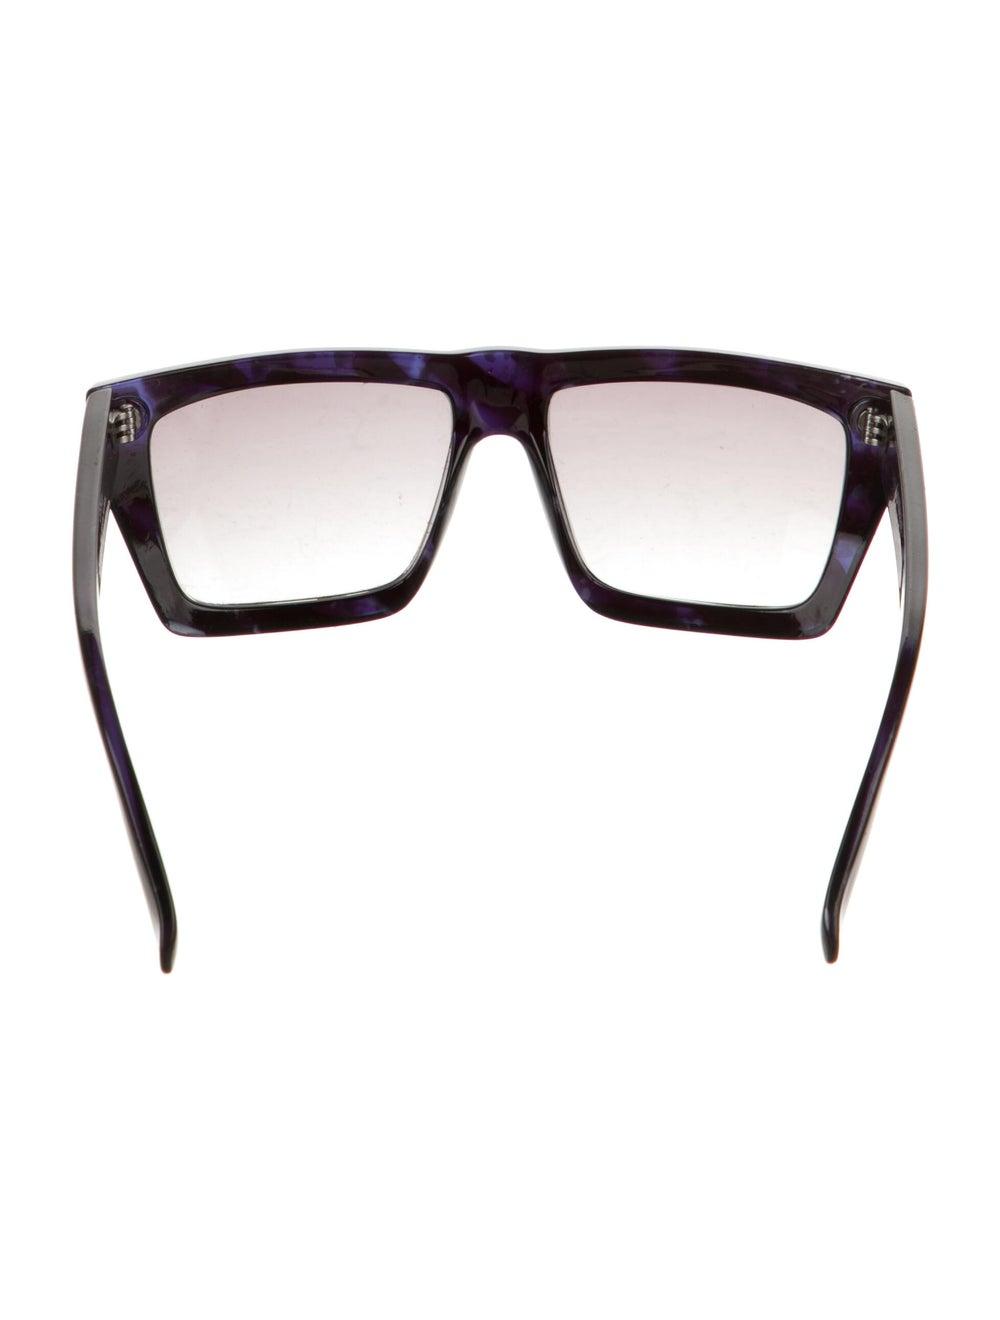 Gianni Versace Square Gradient Sunglasses Blue - image 3